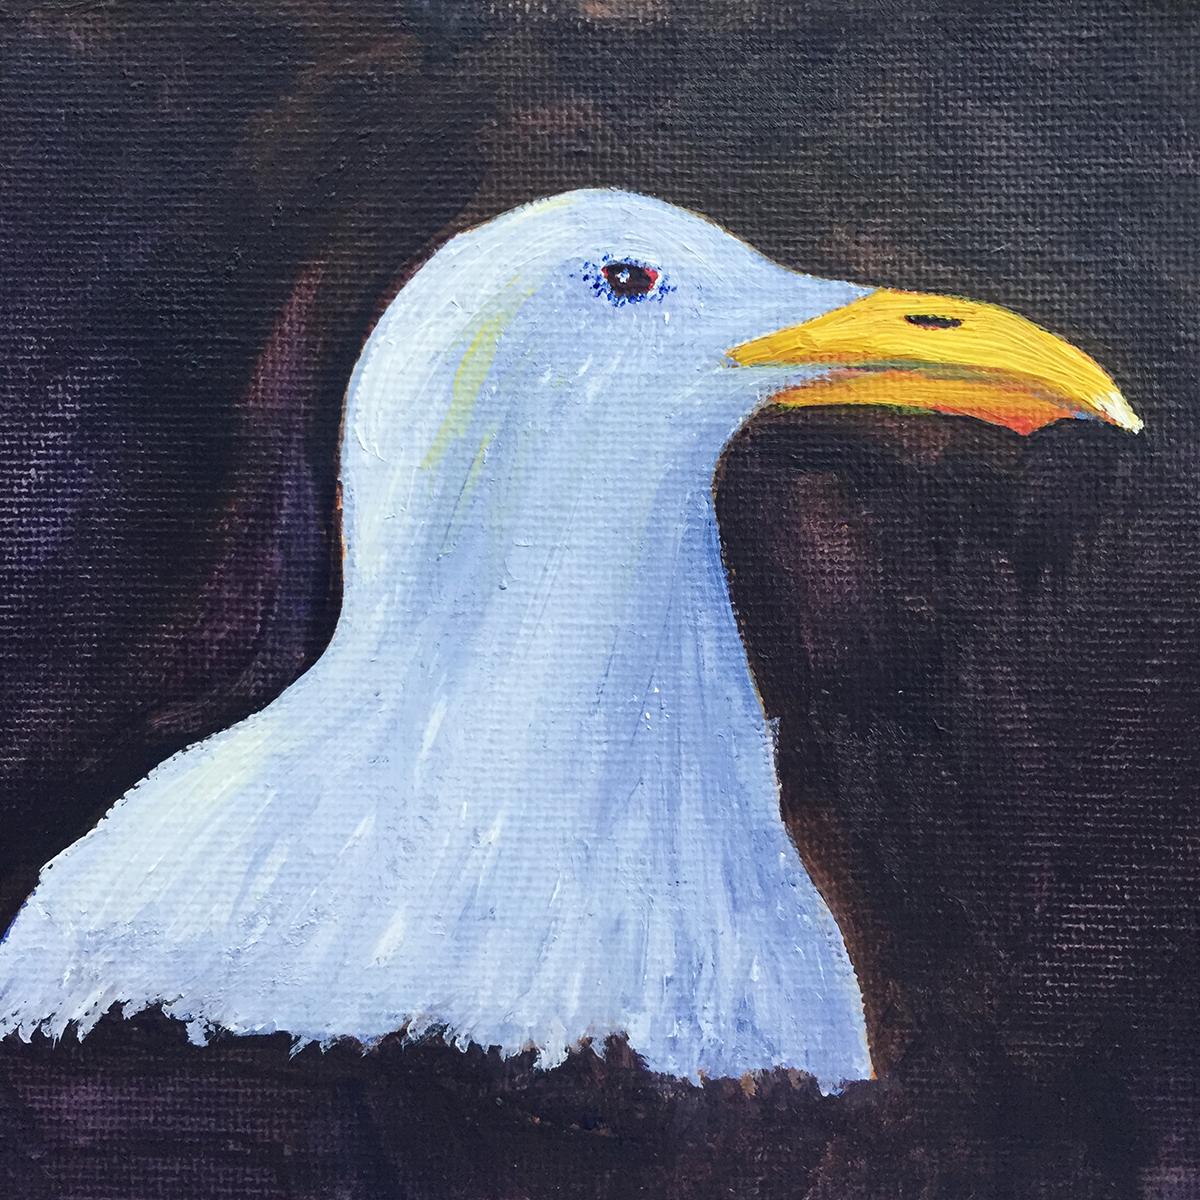 abn-oil-paint-seagull.jpg